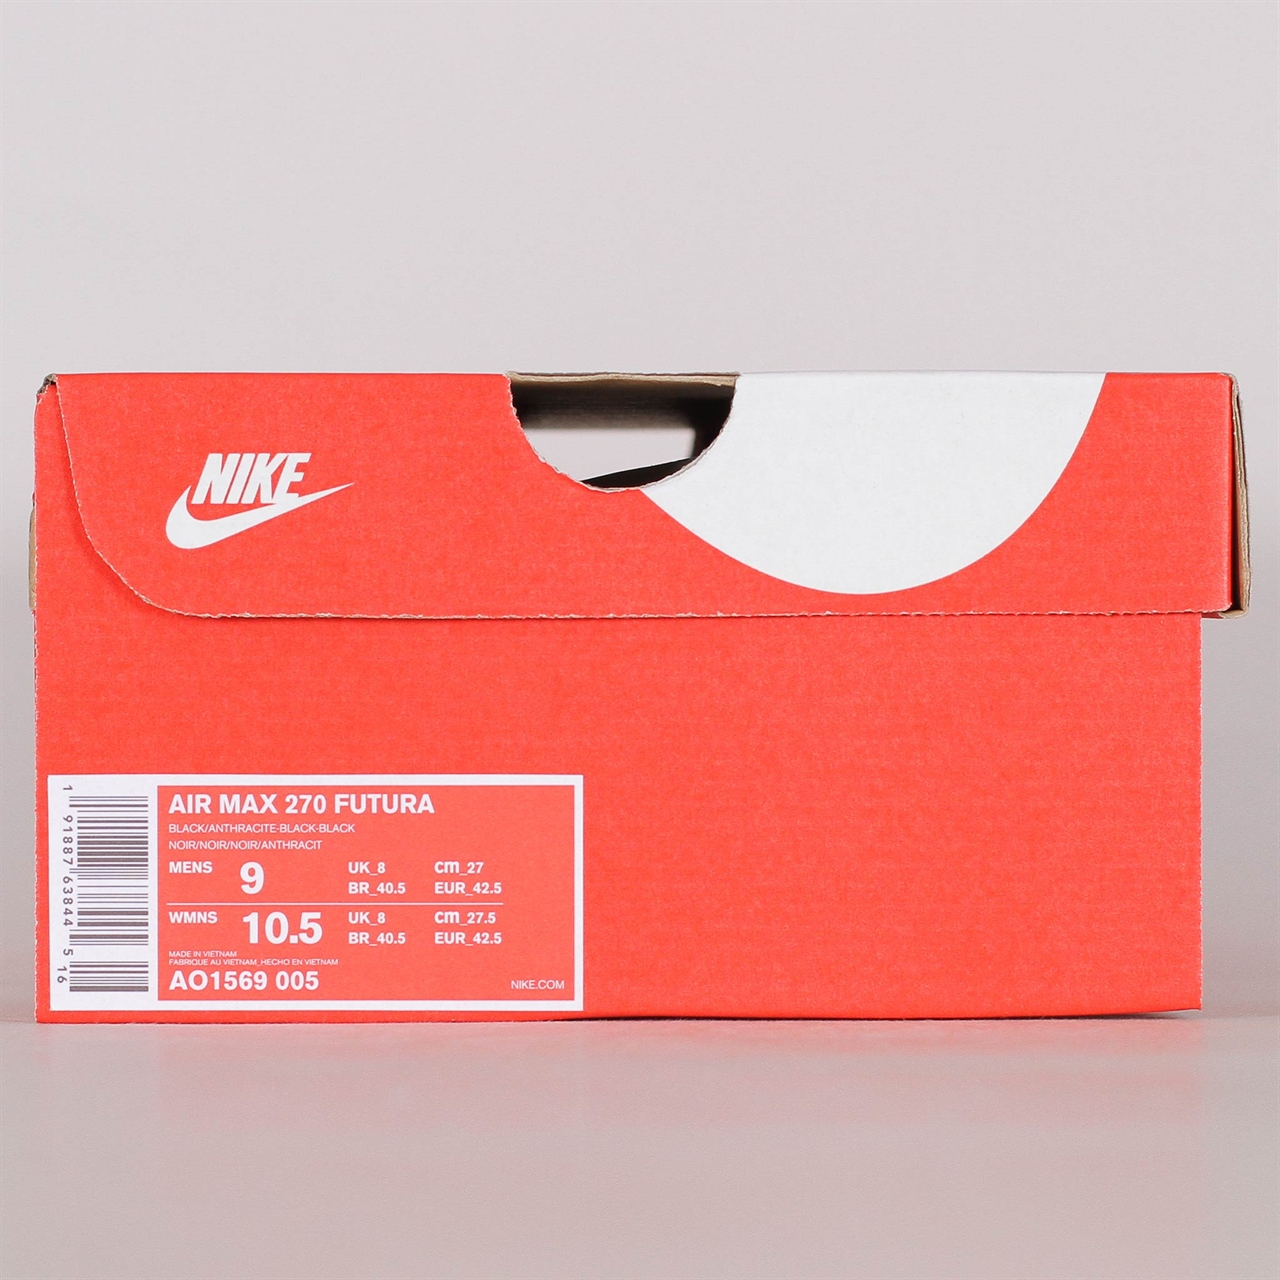 Nike Air Max 270 Futura (AO1569 005) Shelta